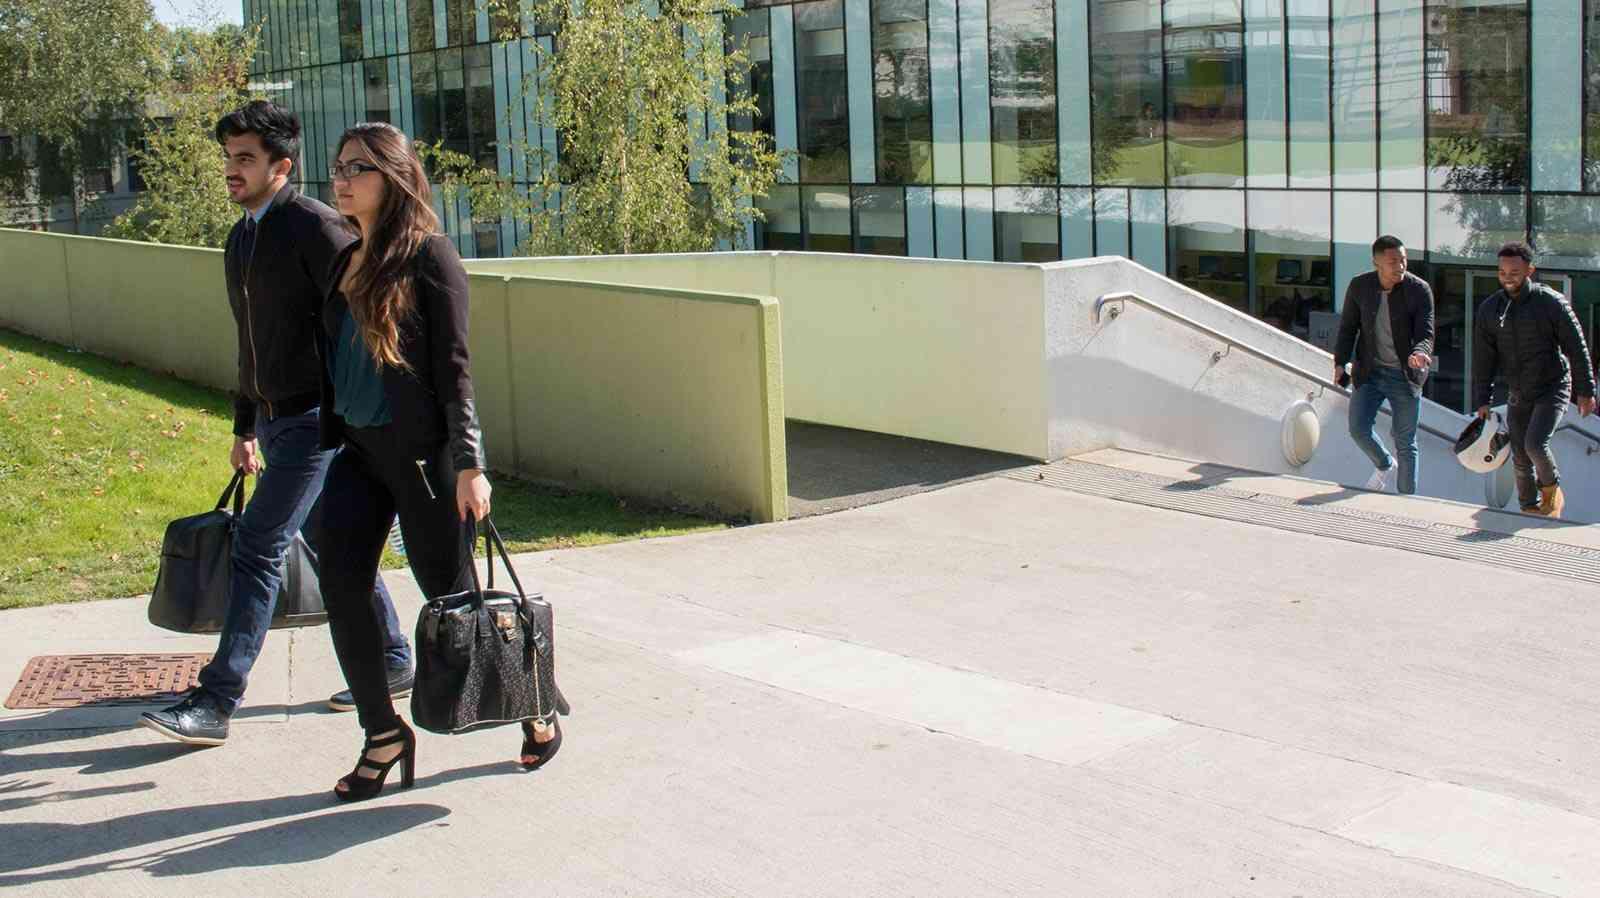 kingston university london a uk based university which features kingston university d one of world s top young universities